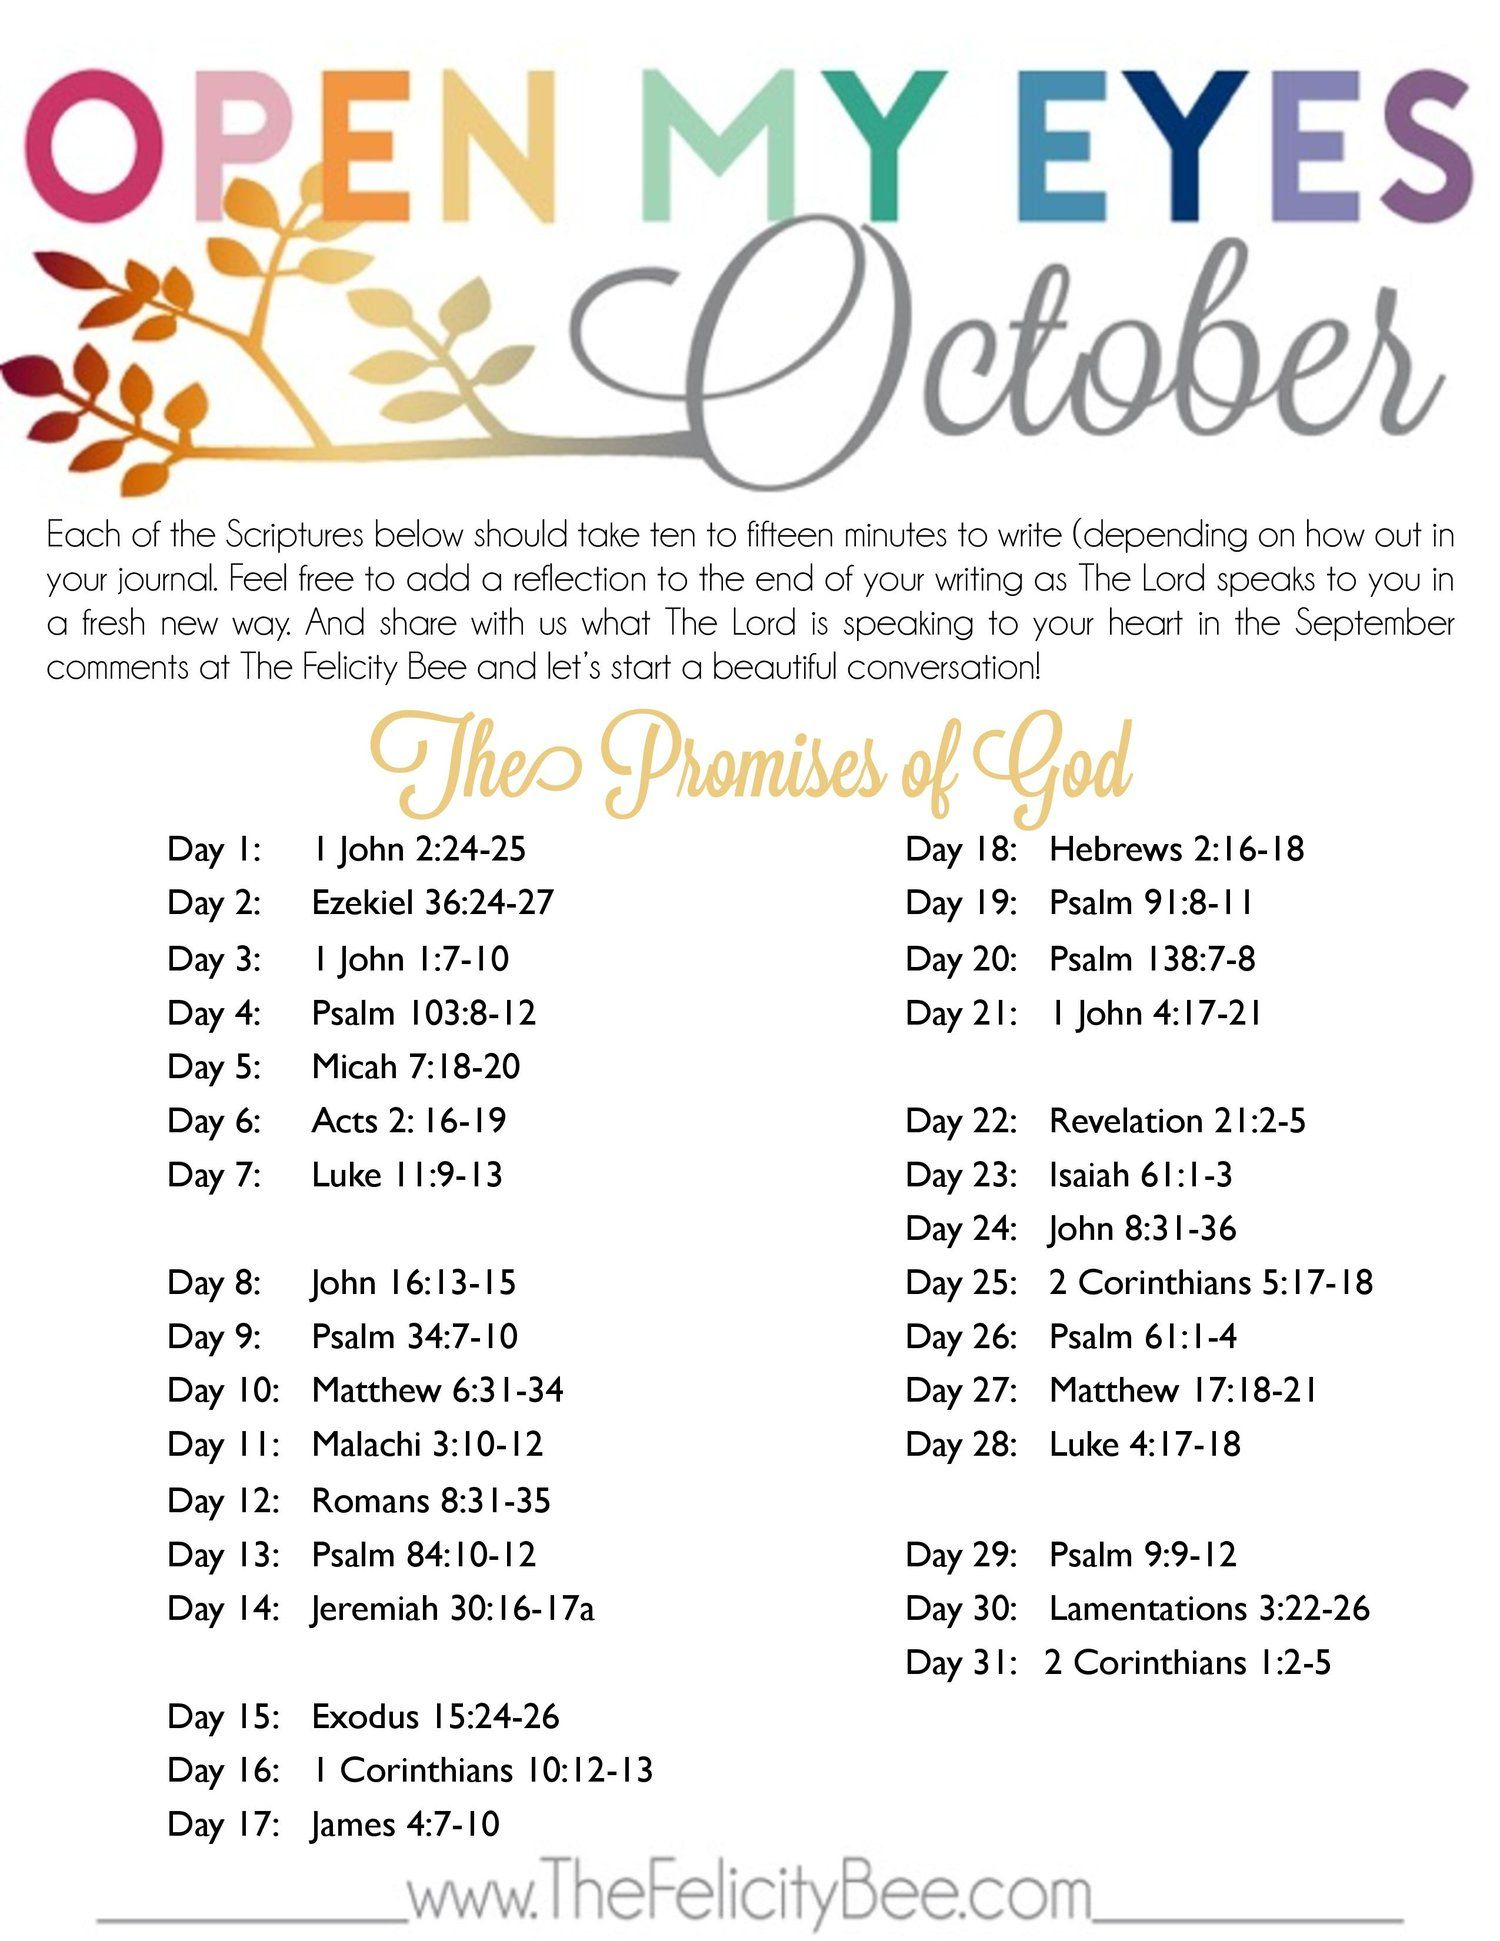 Sep 24 Open My Eyes October Scripture Writing Plan | Gods promises ...